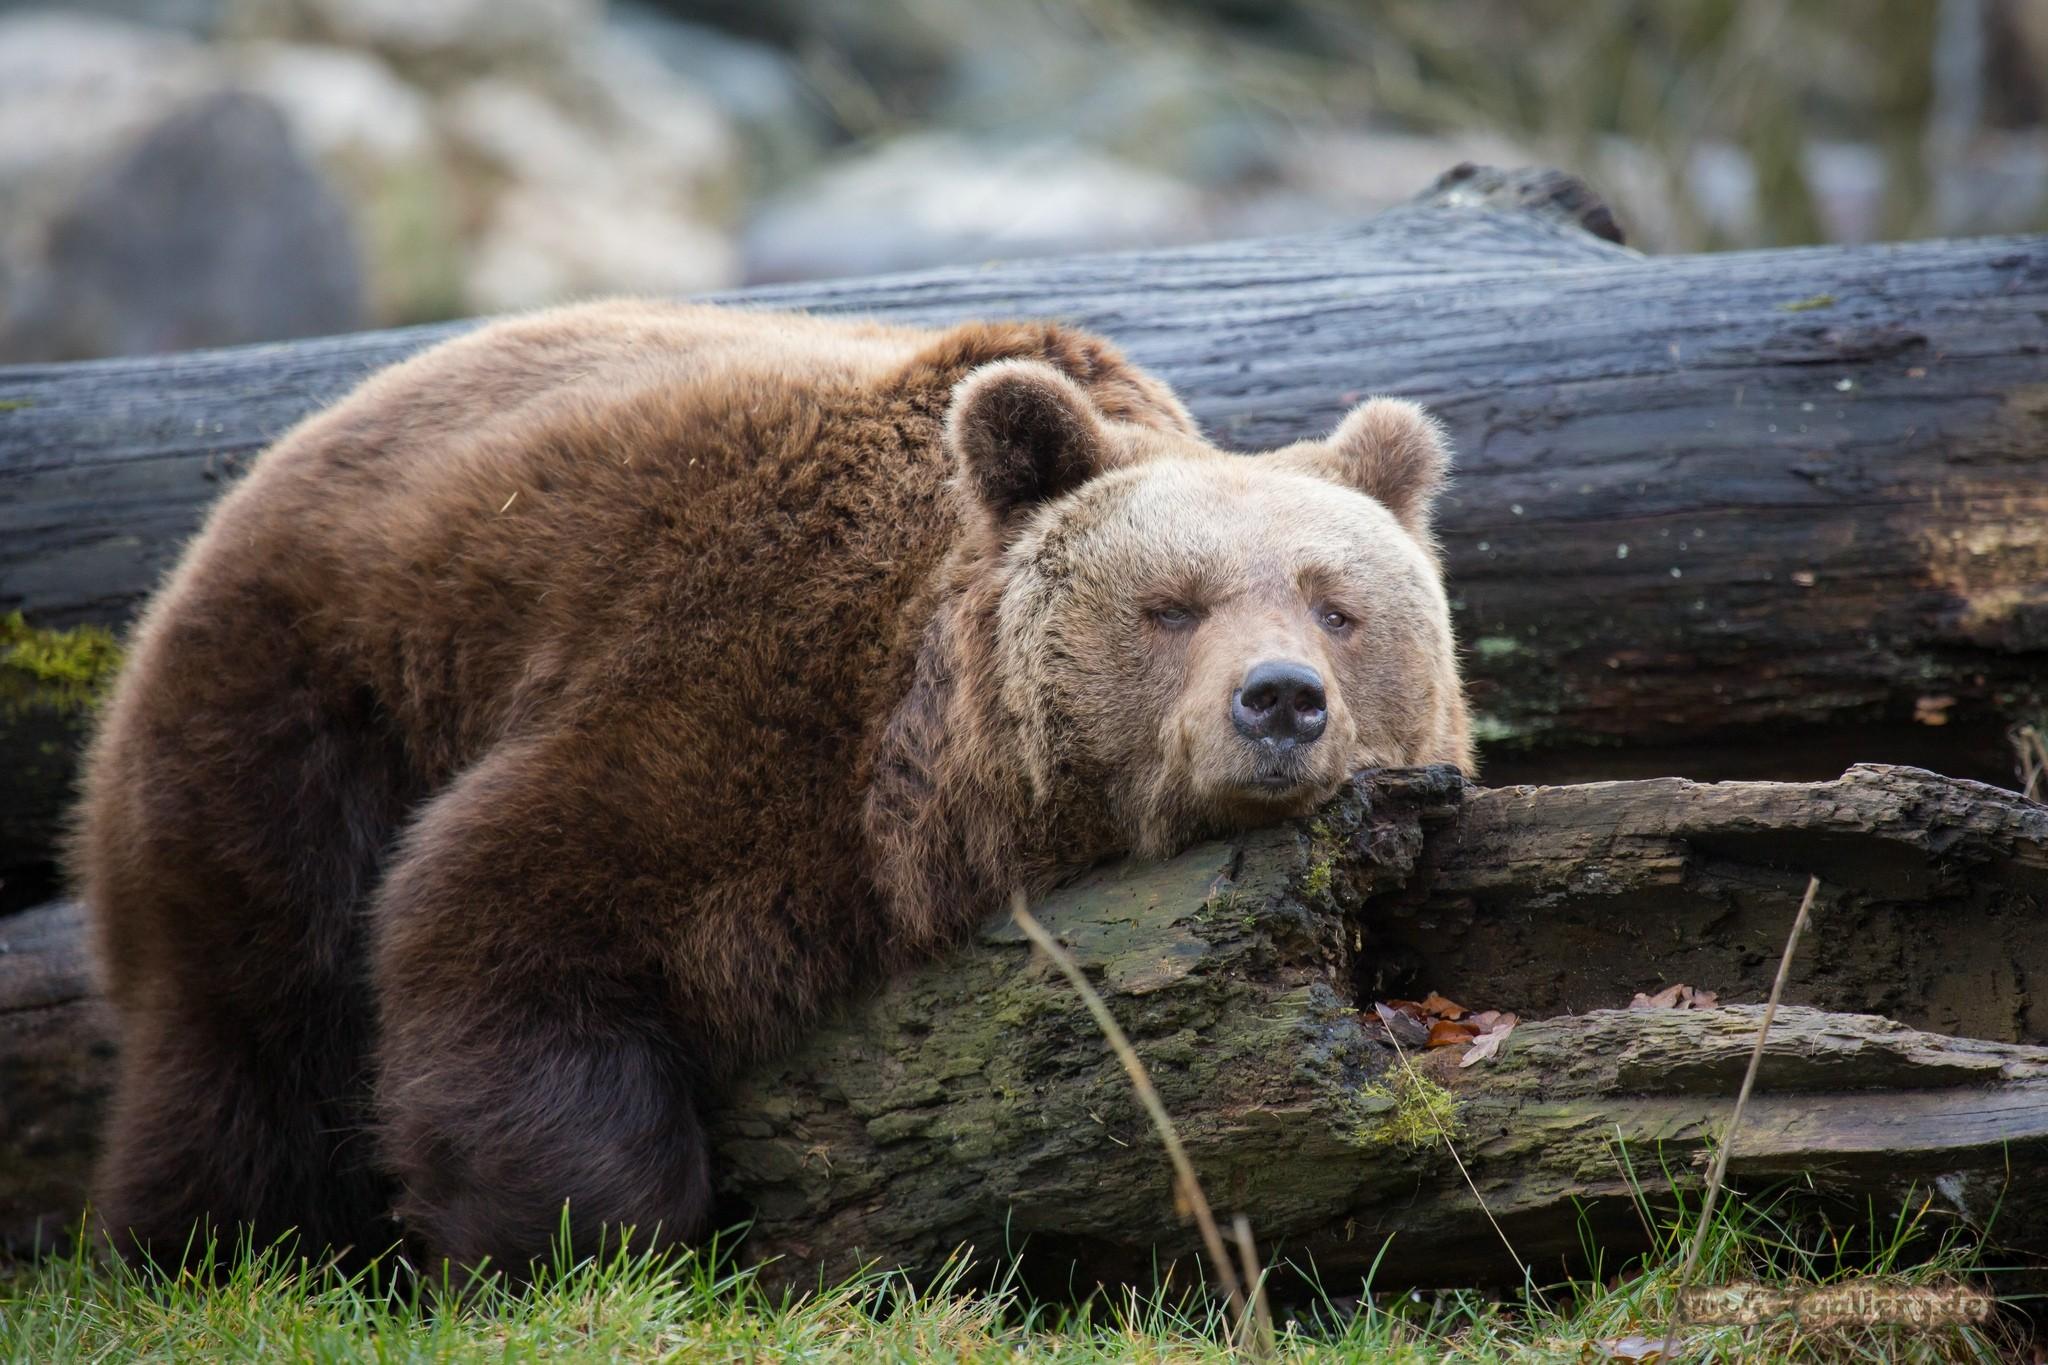 Sfondi : Animali, Natura, Orsi, Zoo, Orso Grizzly, Orso